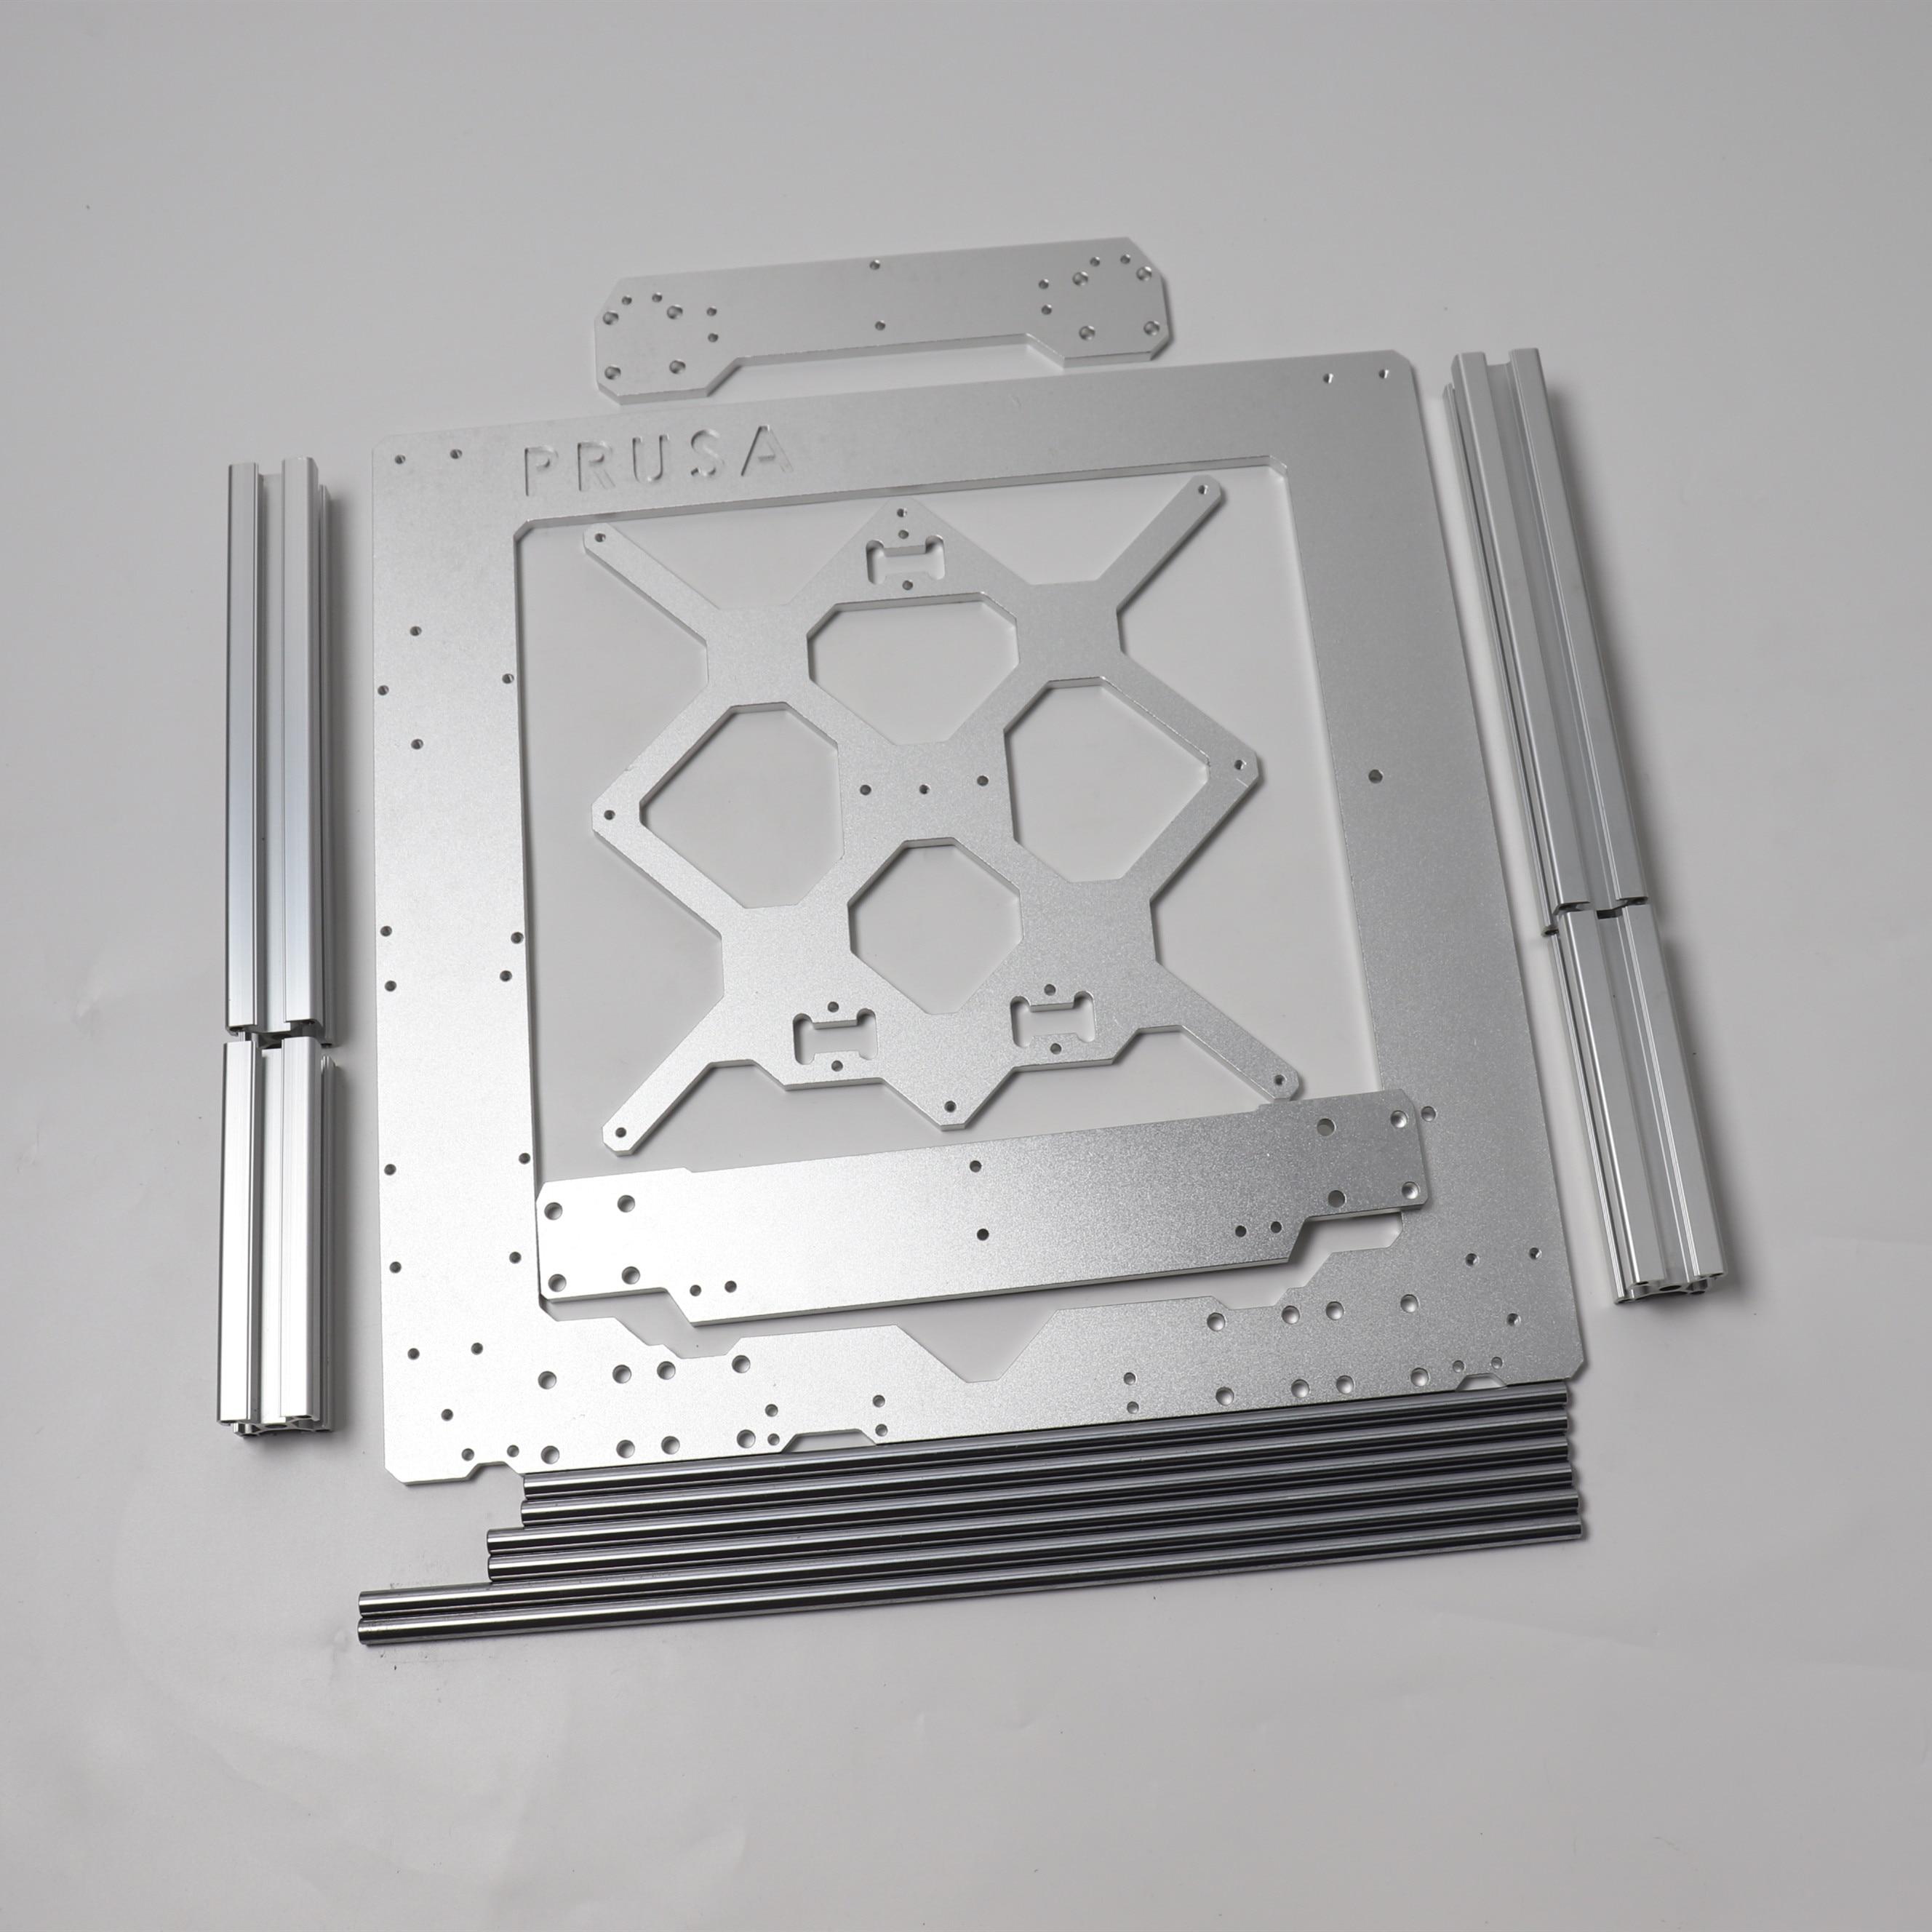 Prusa i3 MK3/MK3S 3d printer aluminum frame 3030 profiles and 8mm OD smooth rods kit